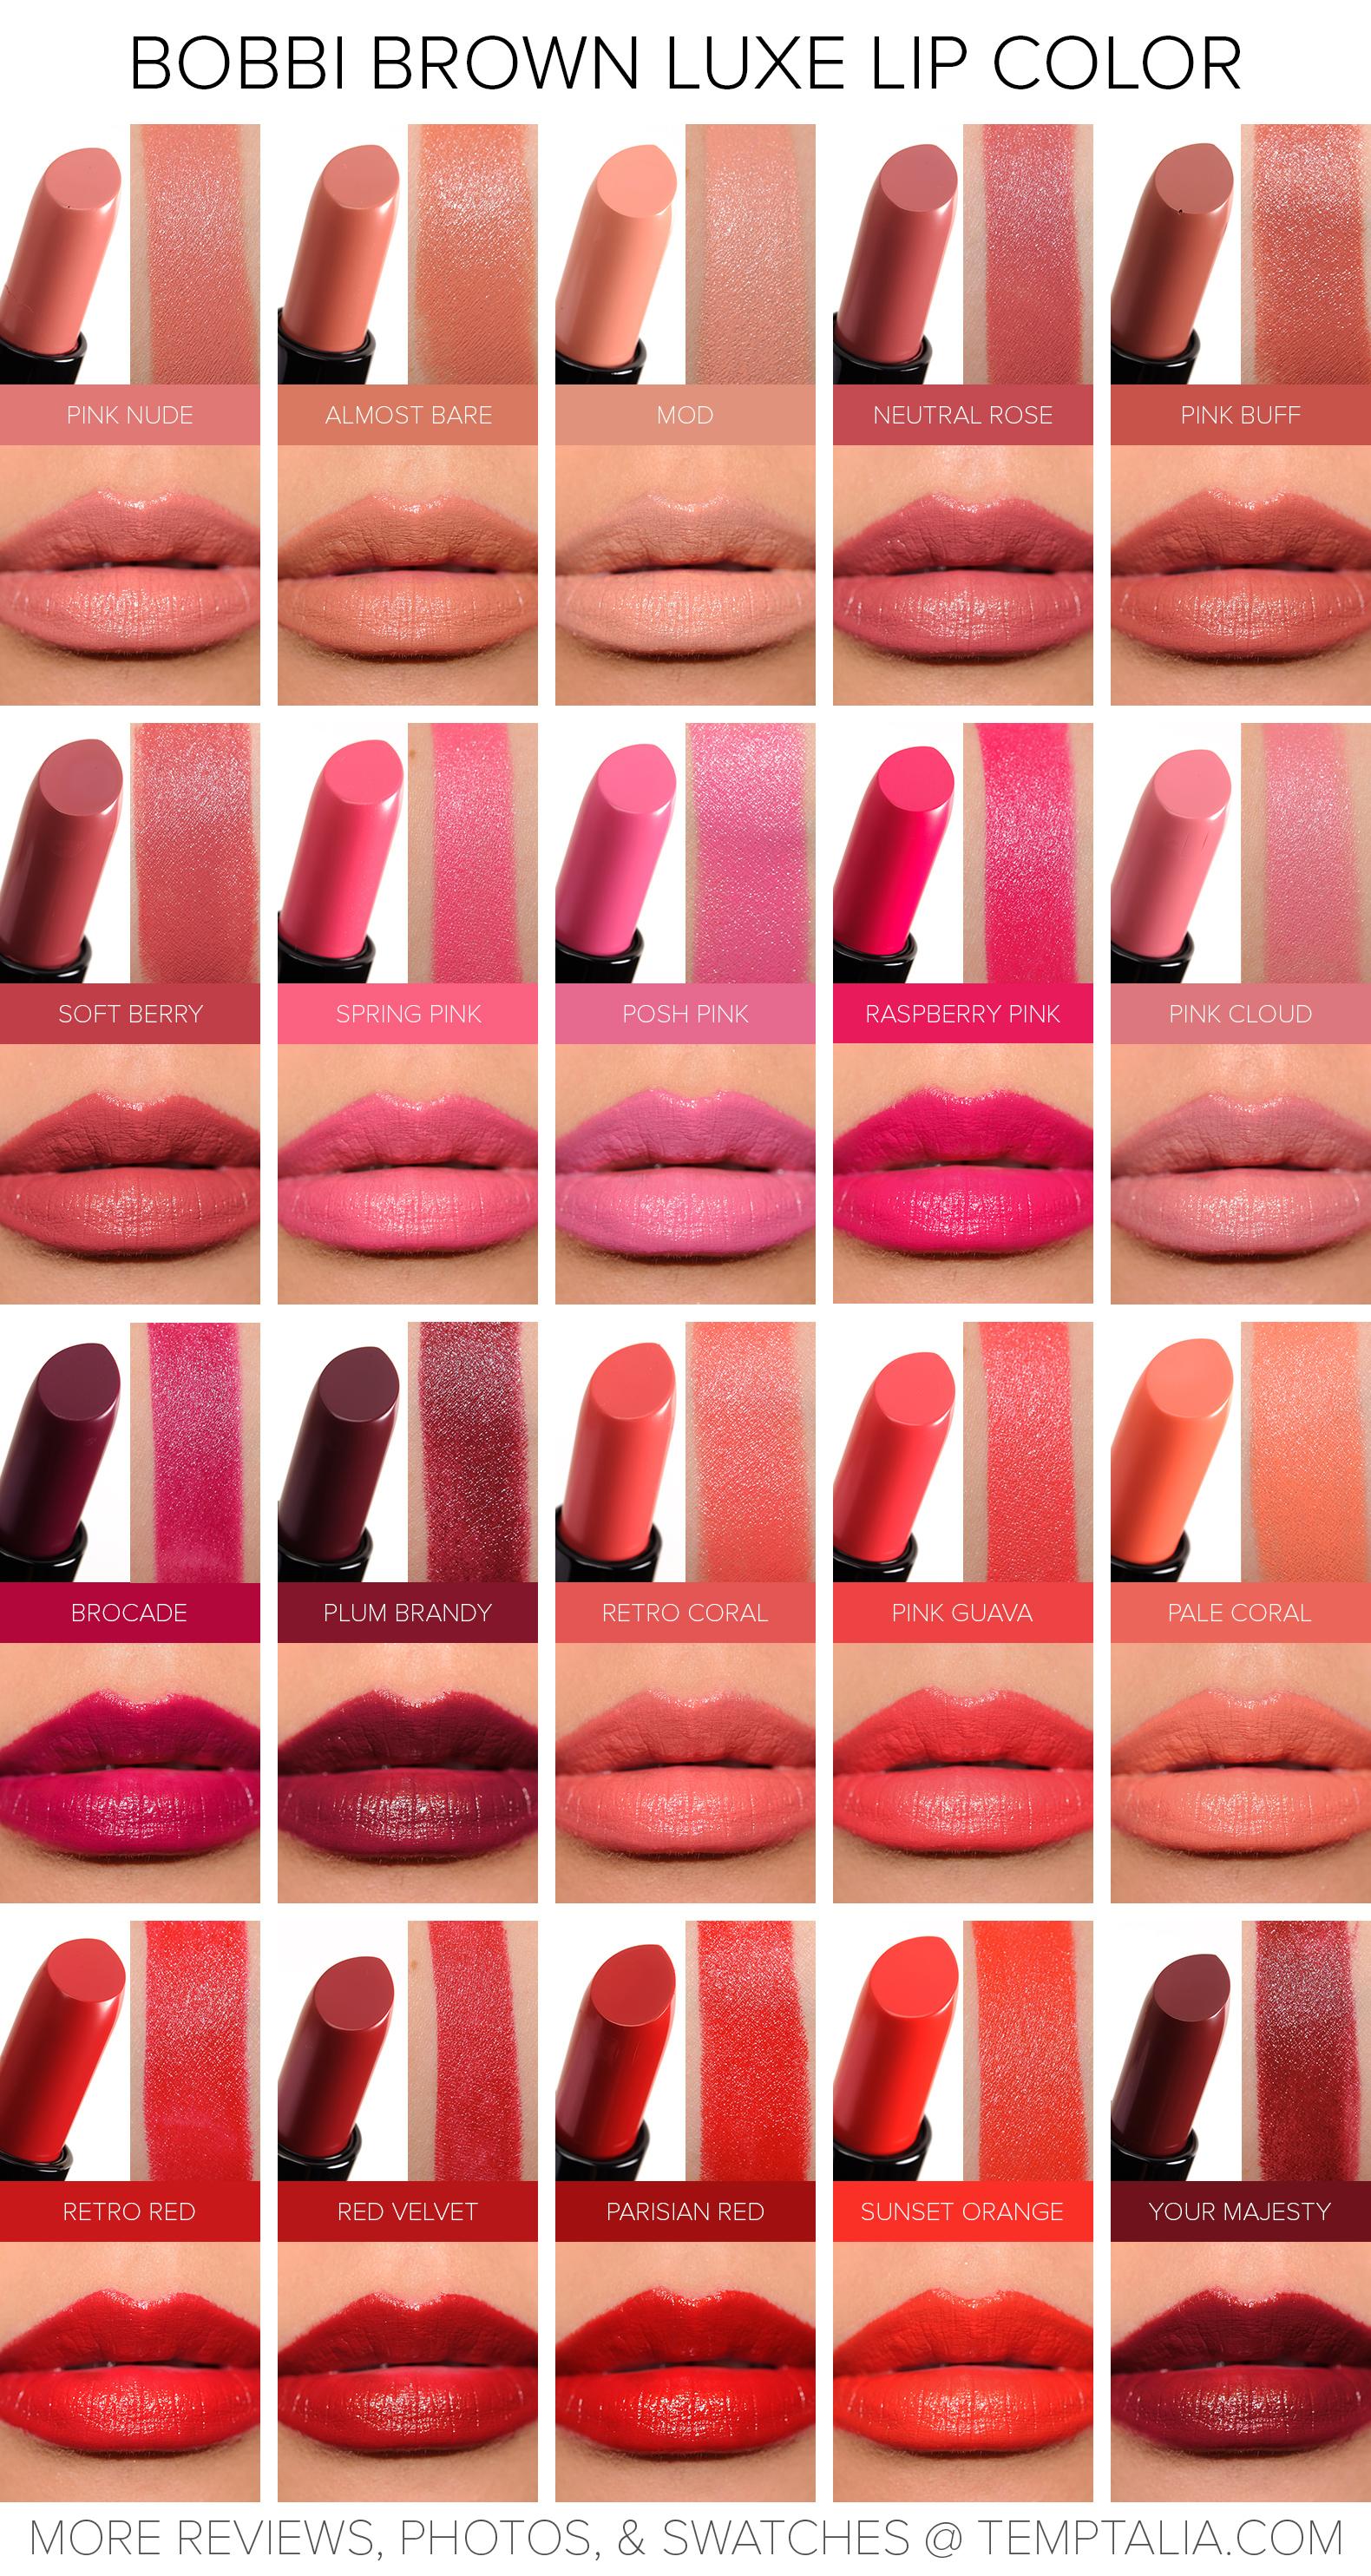 Sneak Peek: Bobbi Brown Luxe Lip Color Photos & Swatches